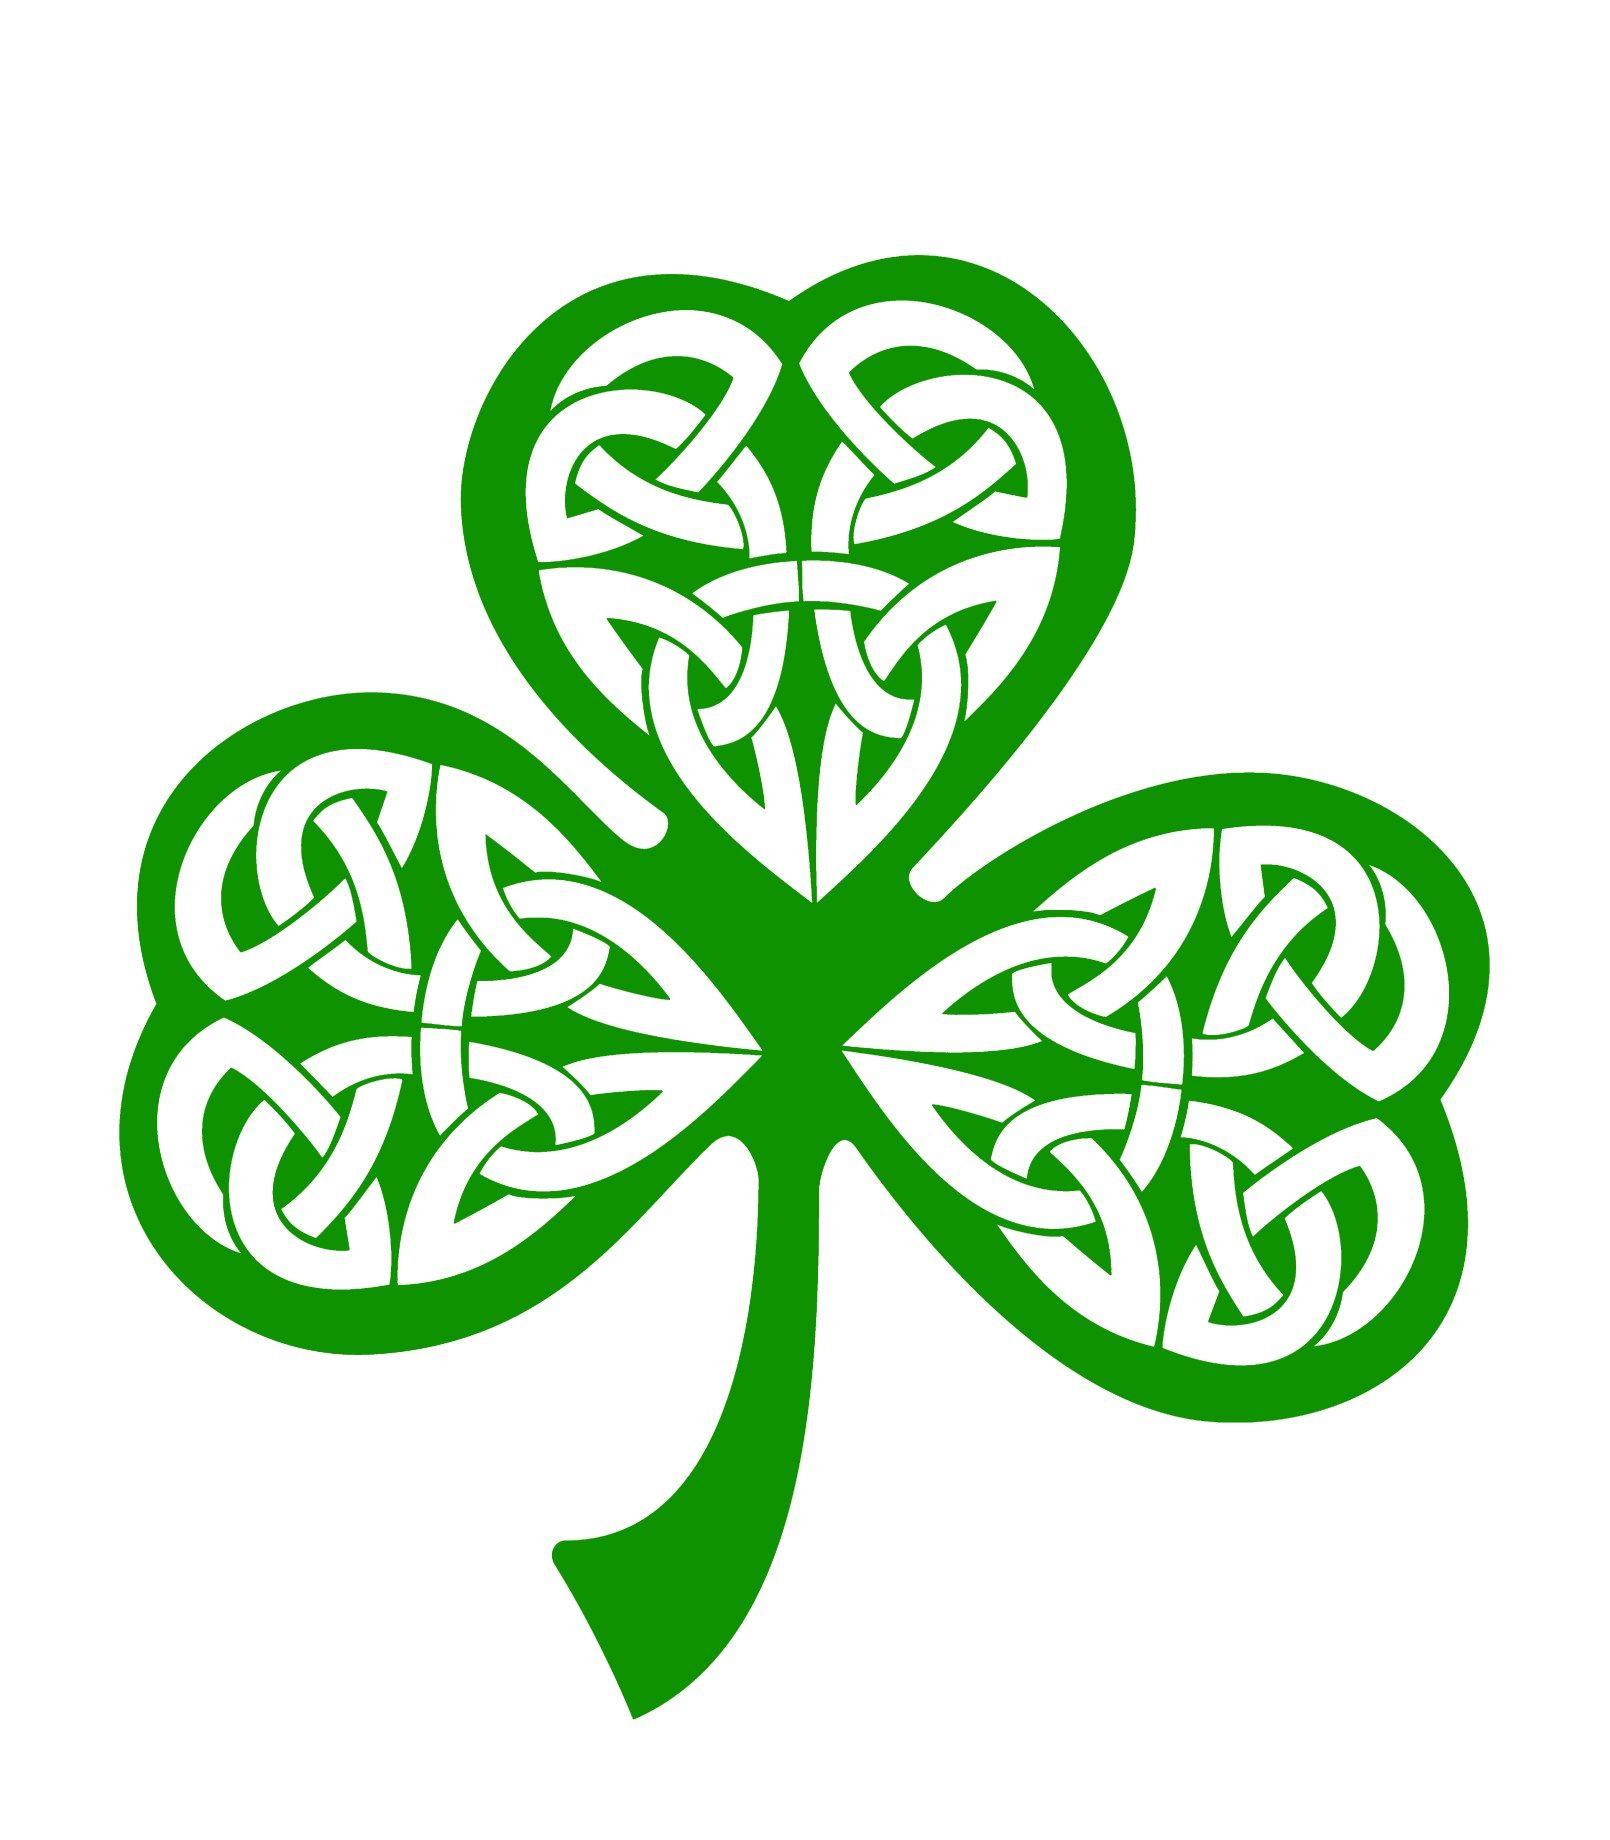 The Shamrock - Celtic Symbols | Irish | Pinterest | Símbolos, Santa ...